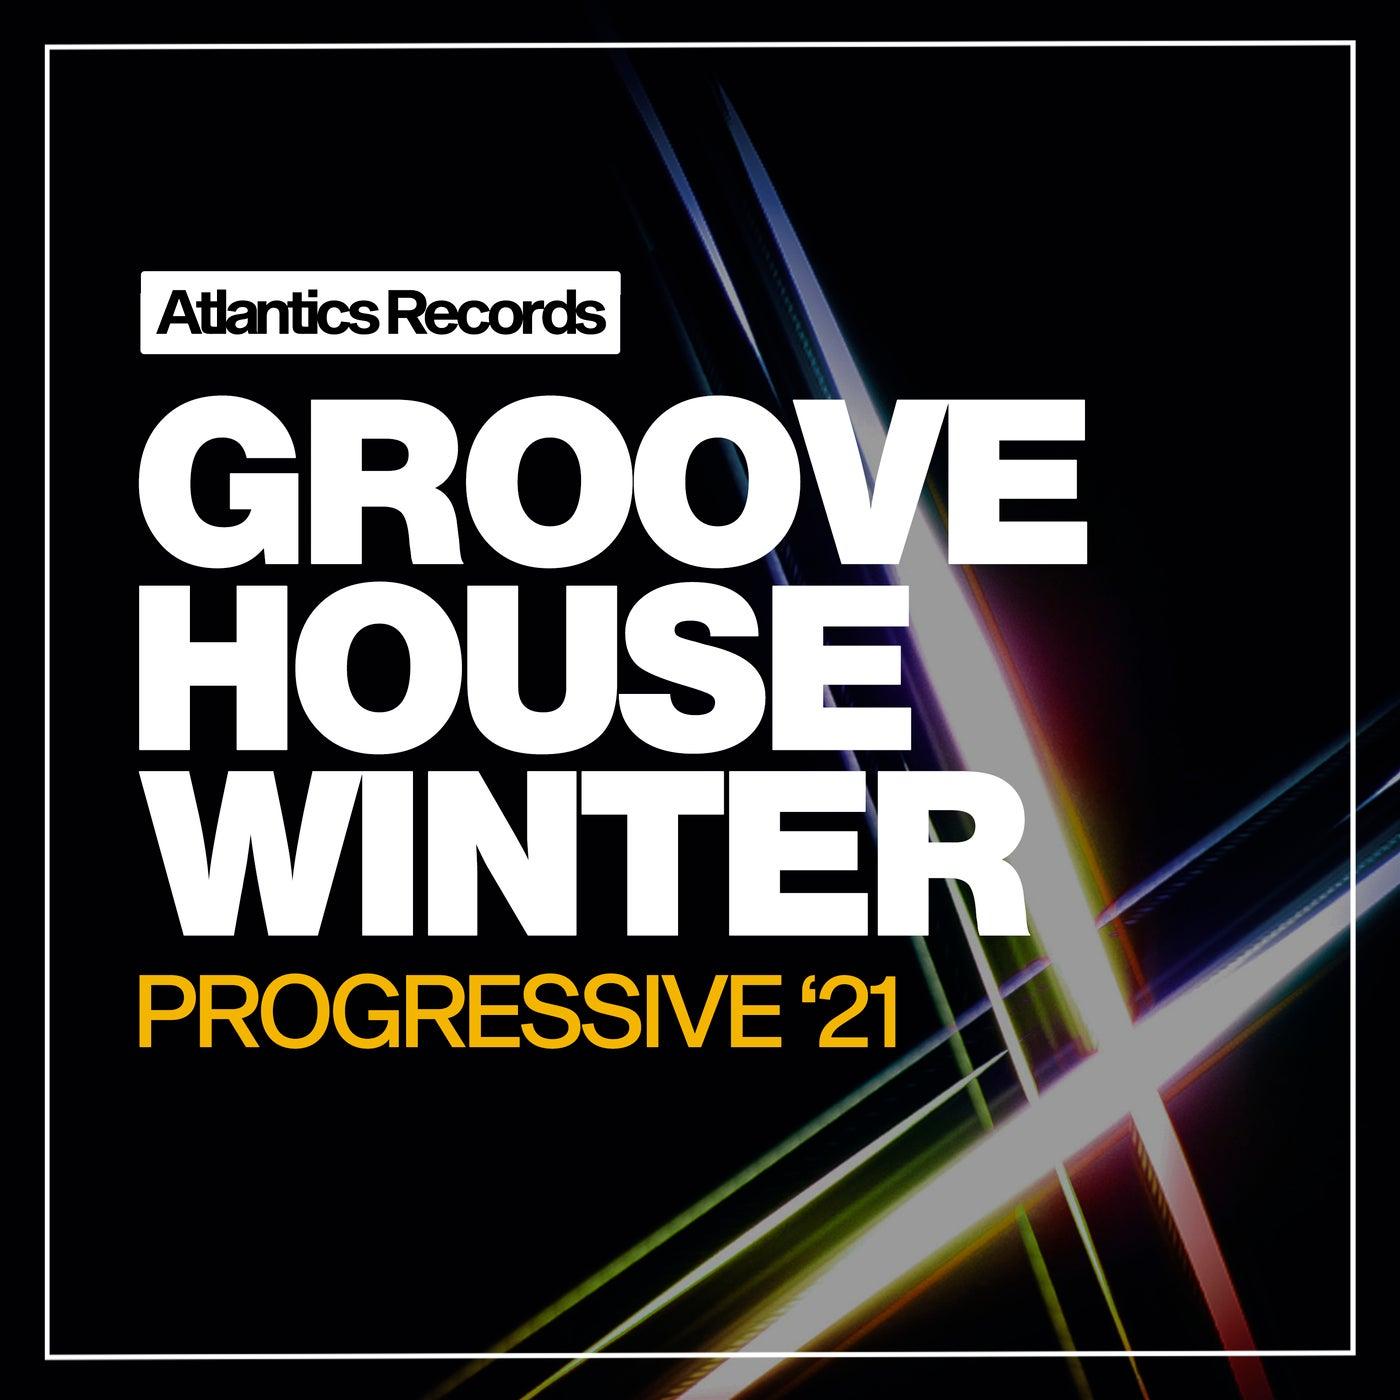 Progressive Groove House Winter '21